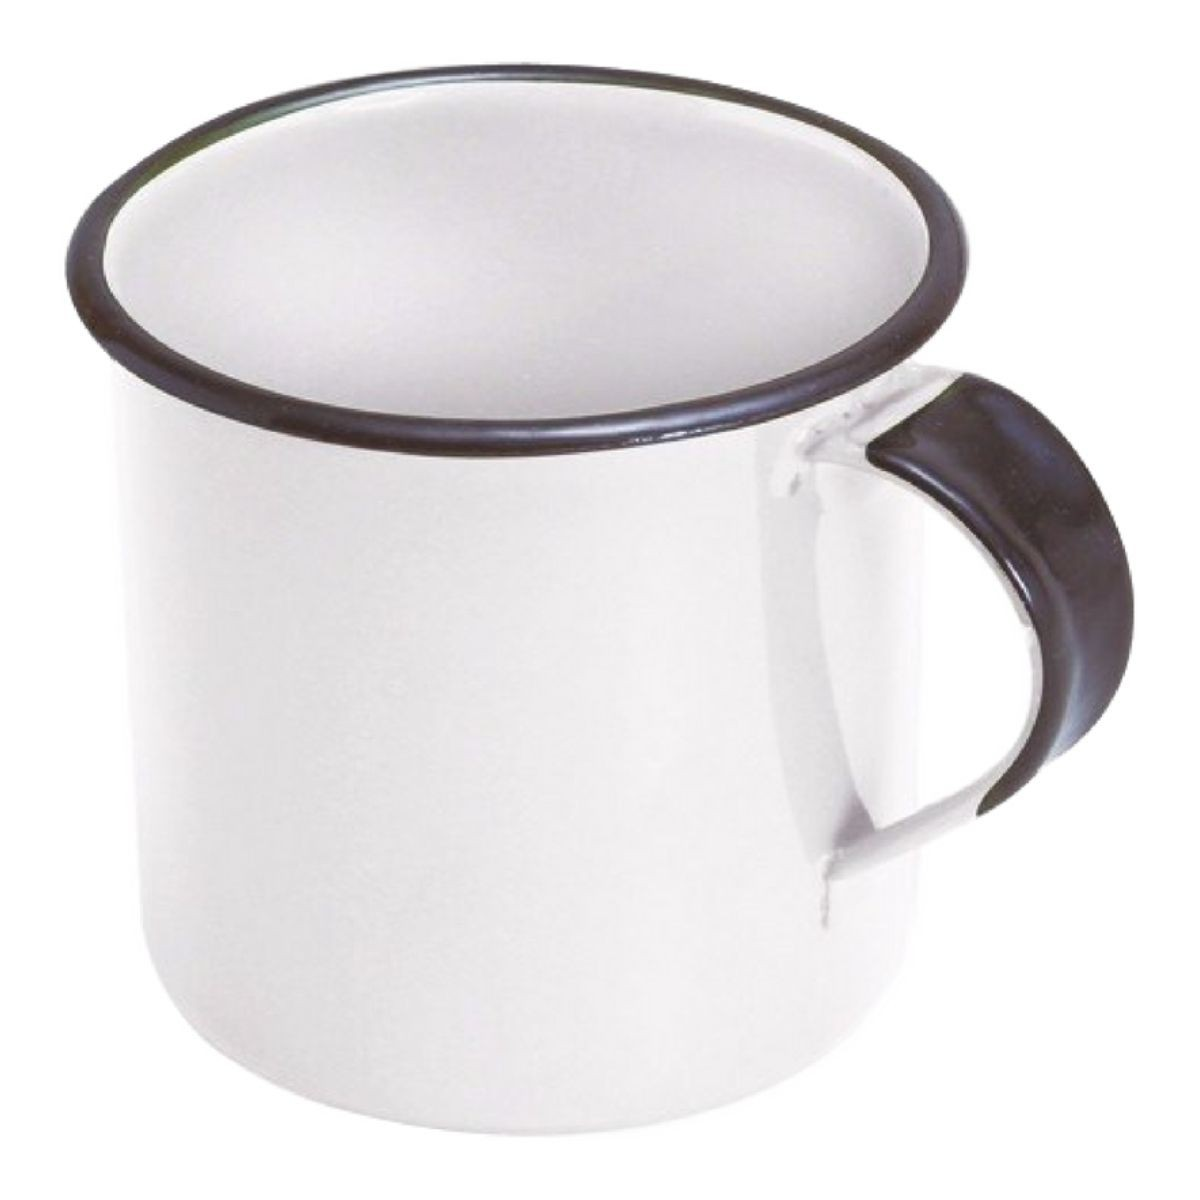 Caneca Esmaltada 180 ml